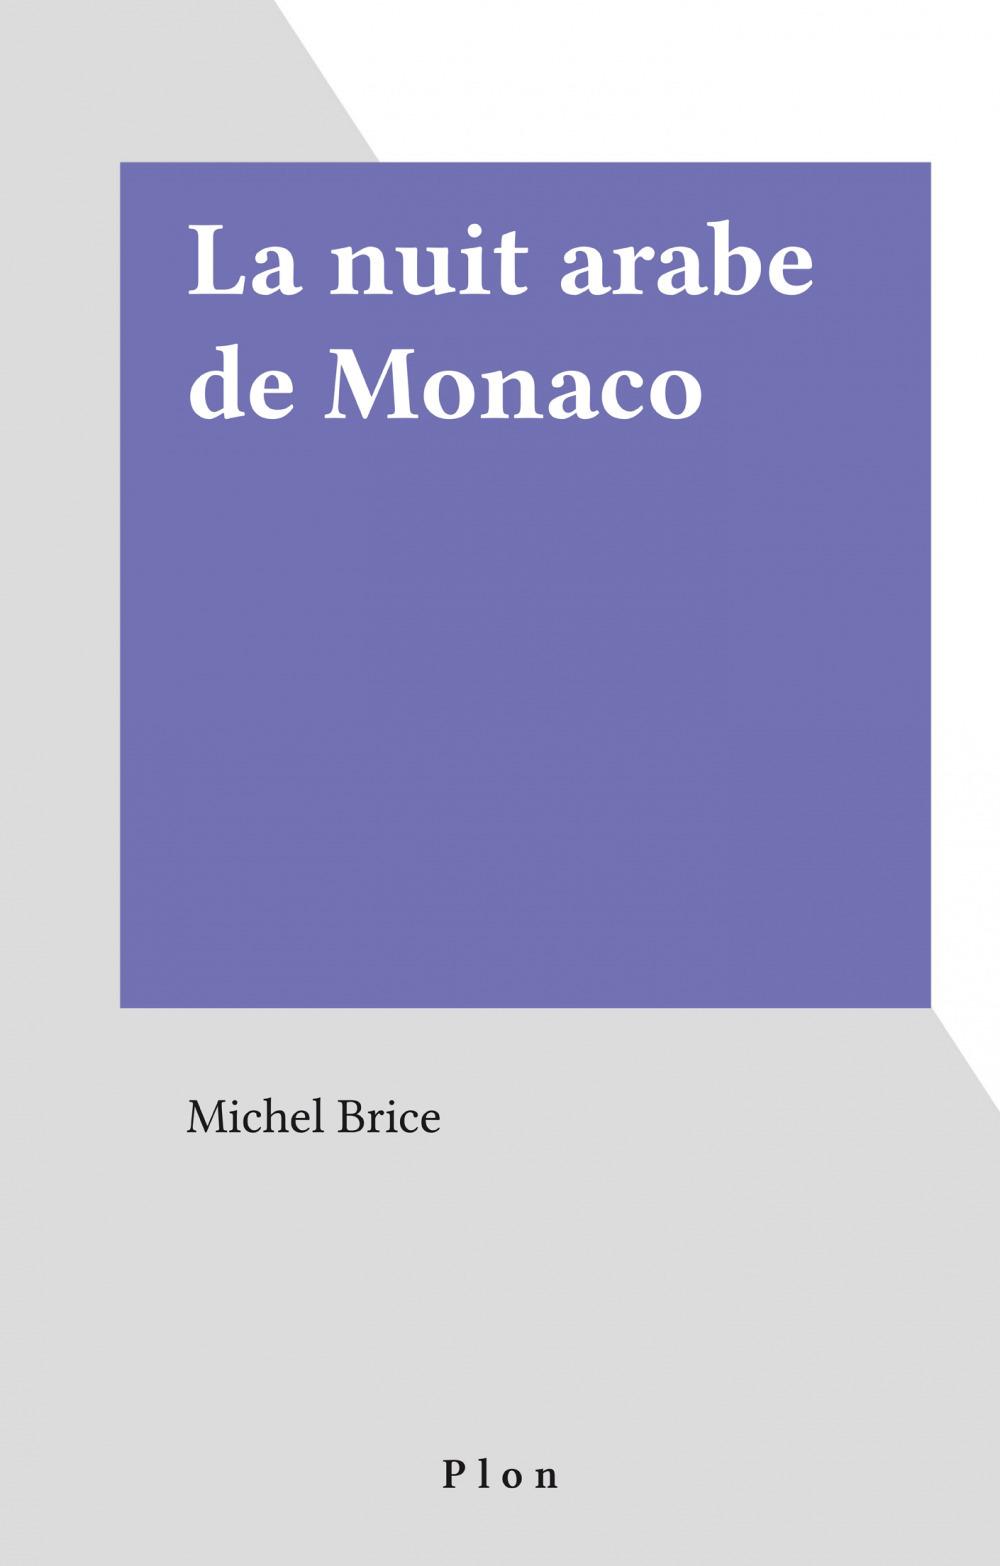 Nuit arabe de monaco